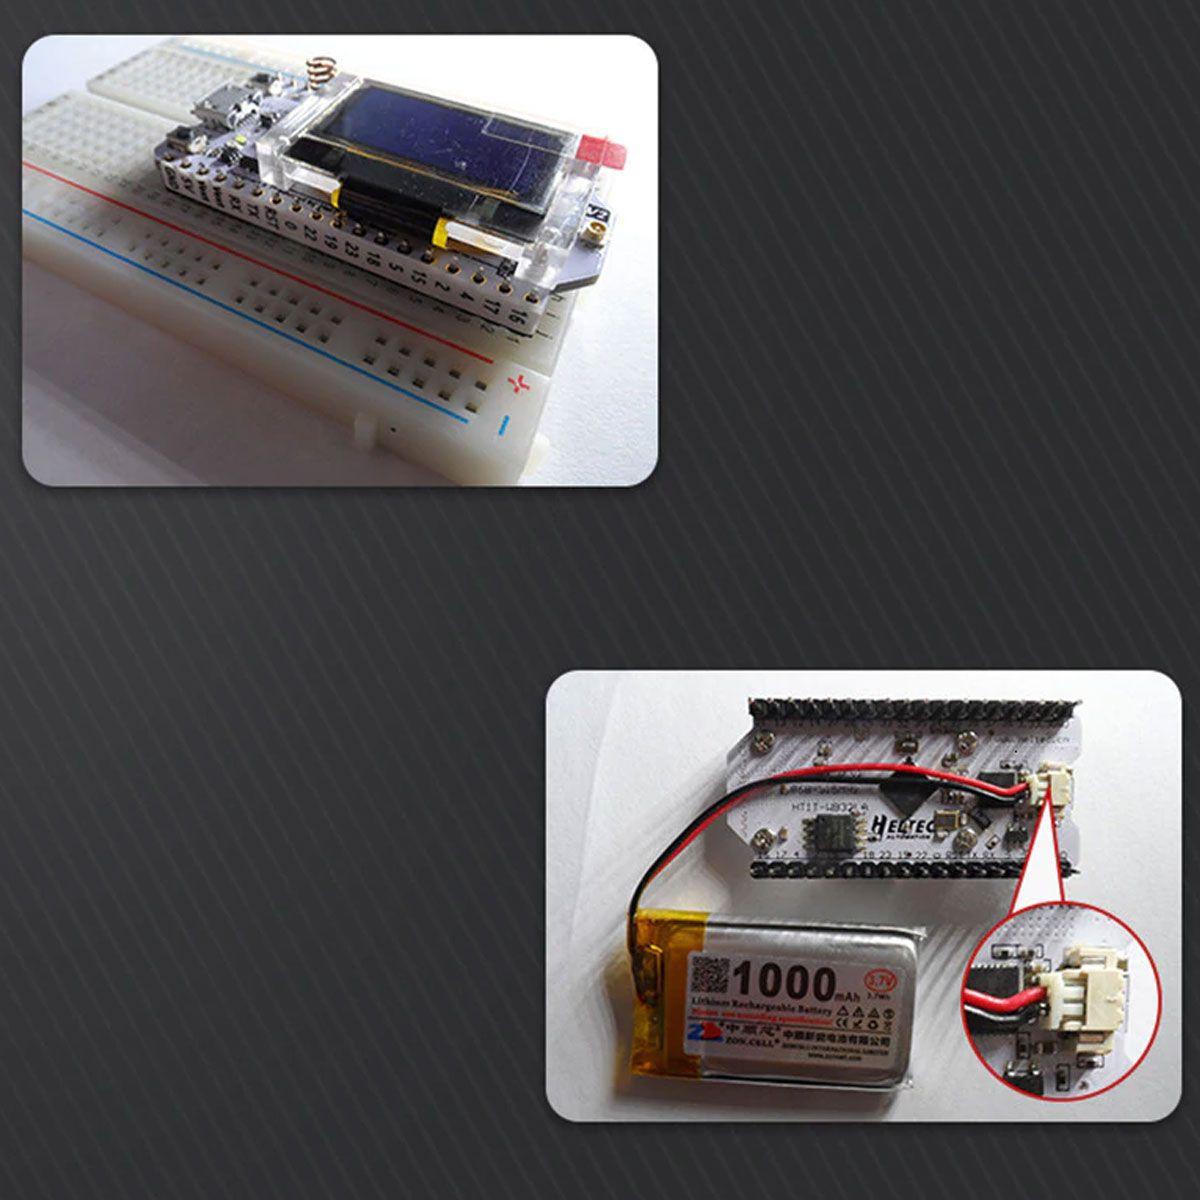 Esp32 V2 Lora Display Oled Wifi 915mhz Heltec Ble com Antena